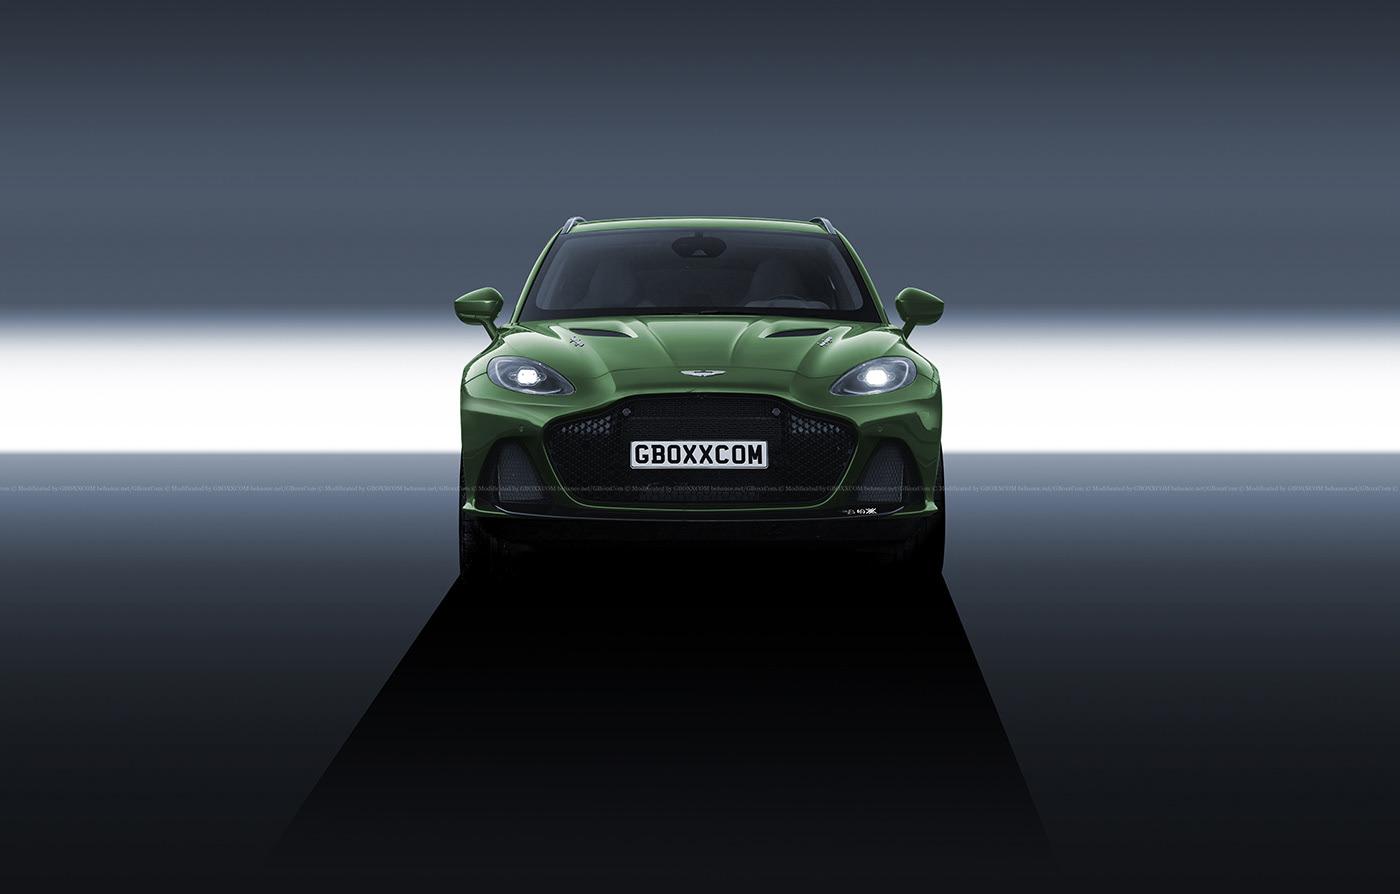 2021-Aston-Martin-DBX-Superleggera-1